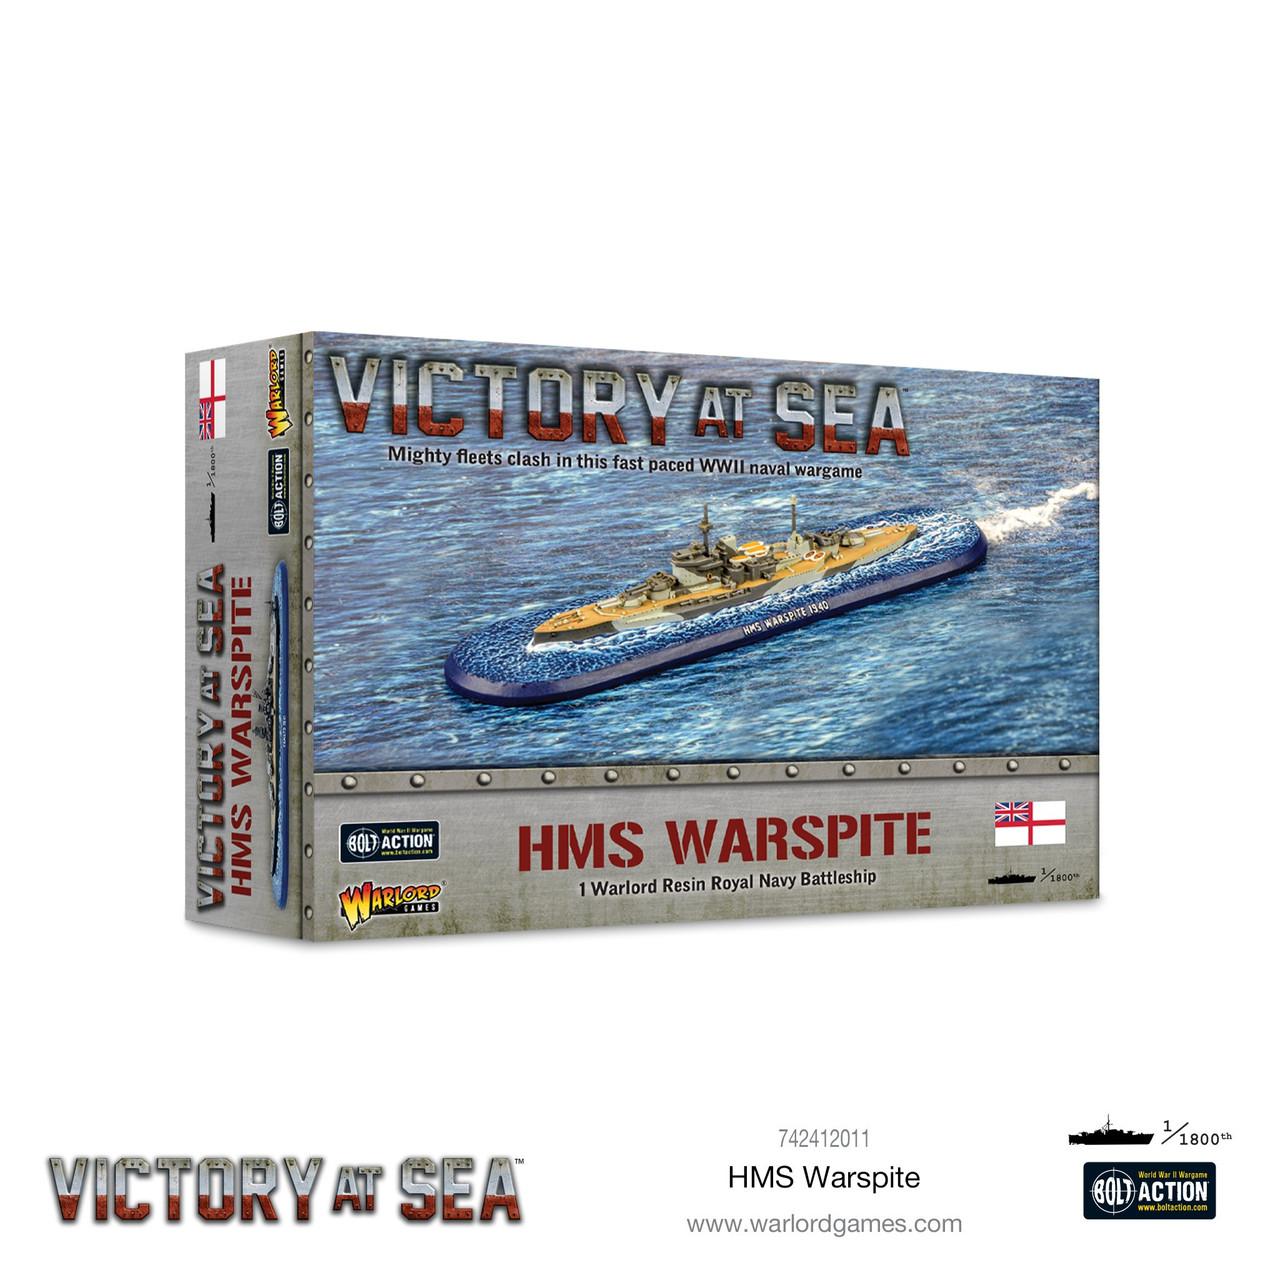 HMS Warspite -  742412011